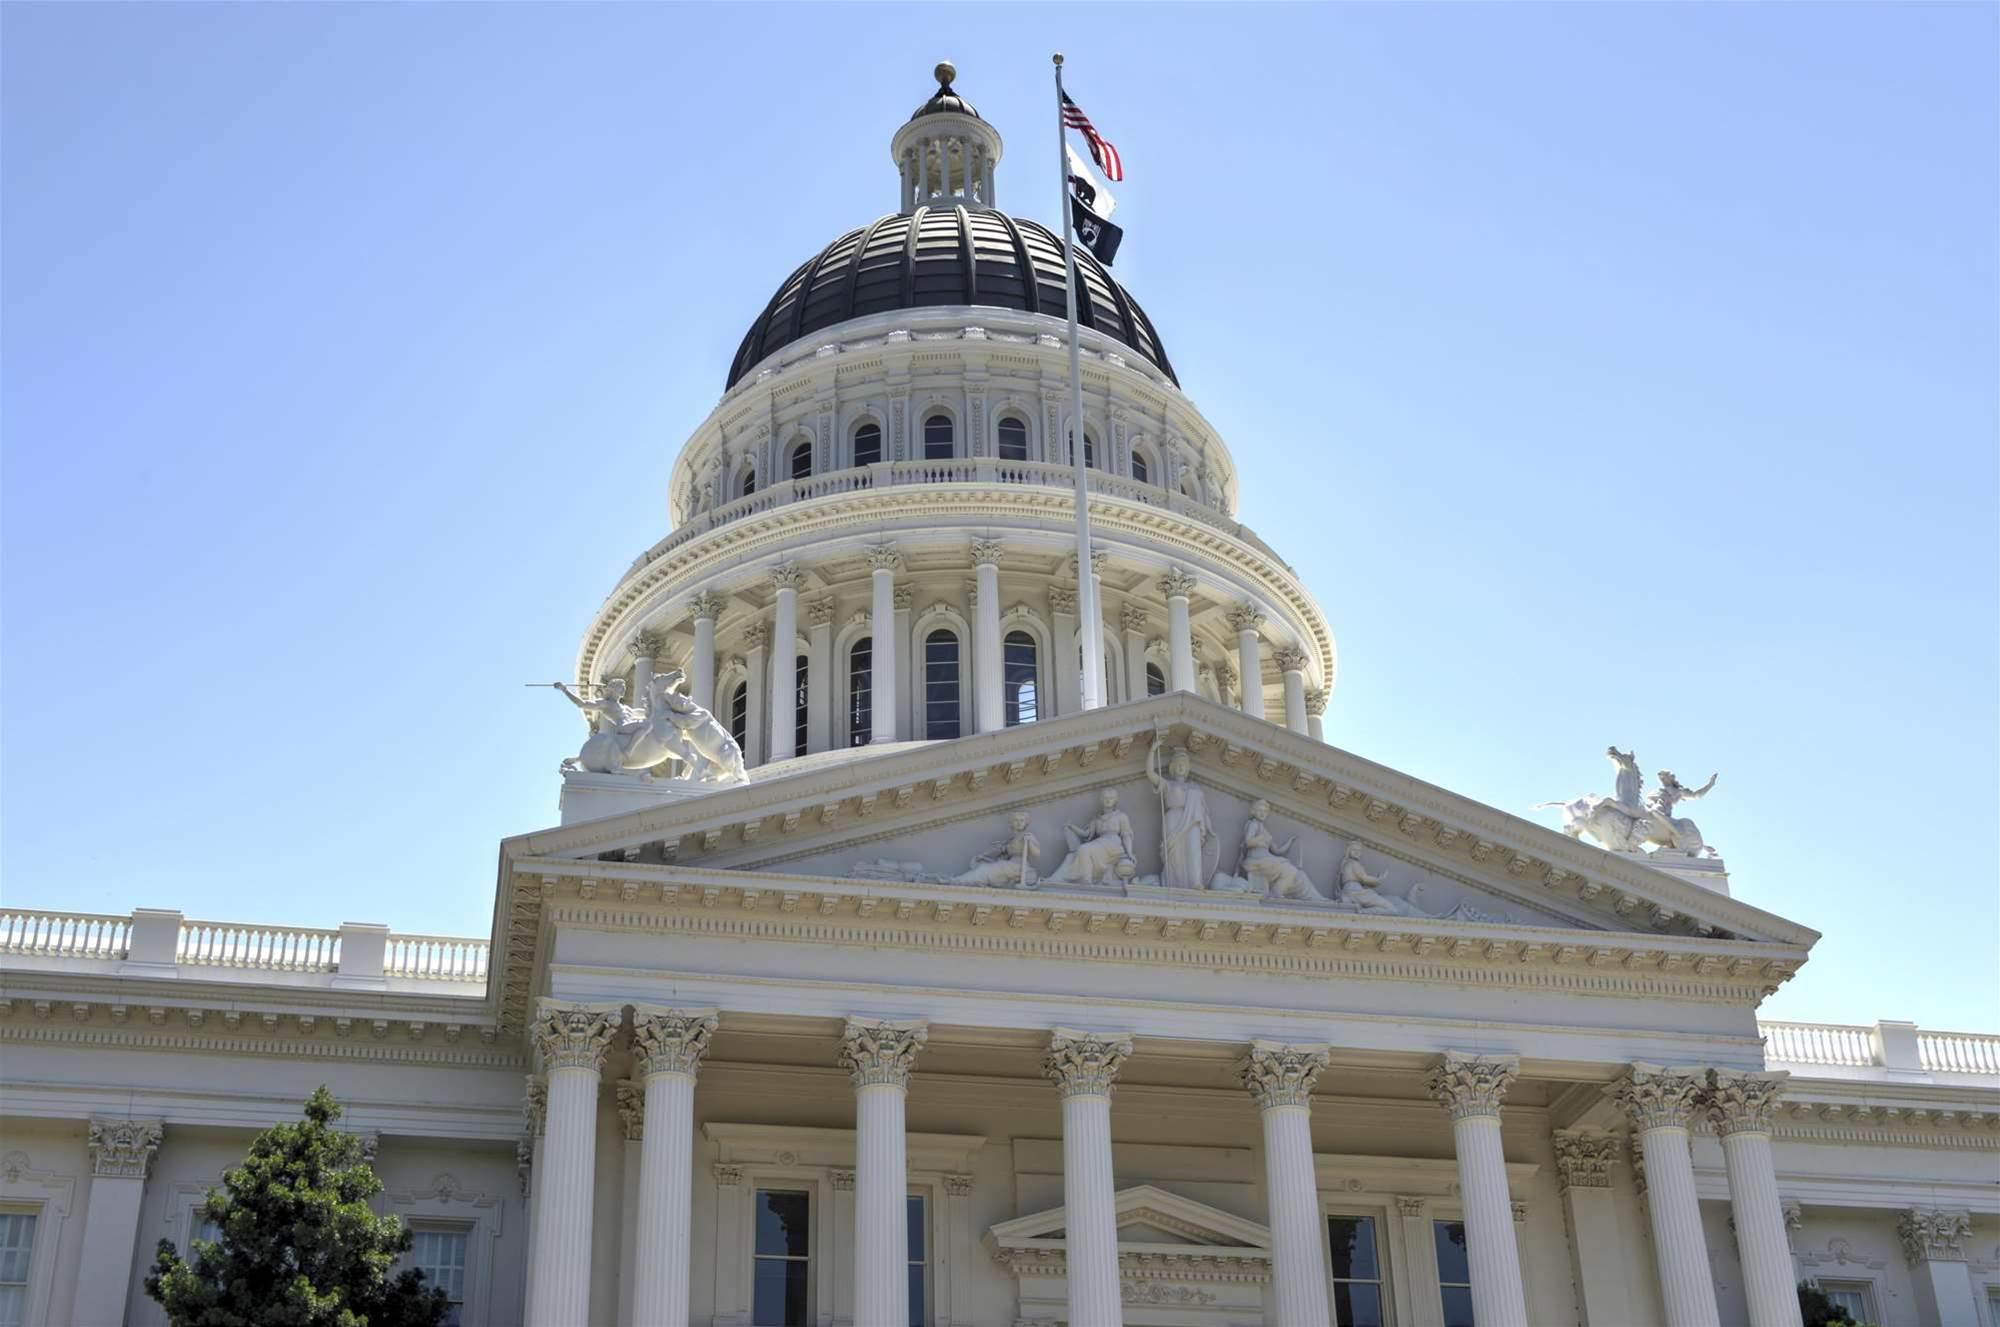 US Senators fight to amend 30 year-old data privacy legislation